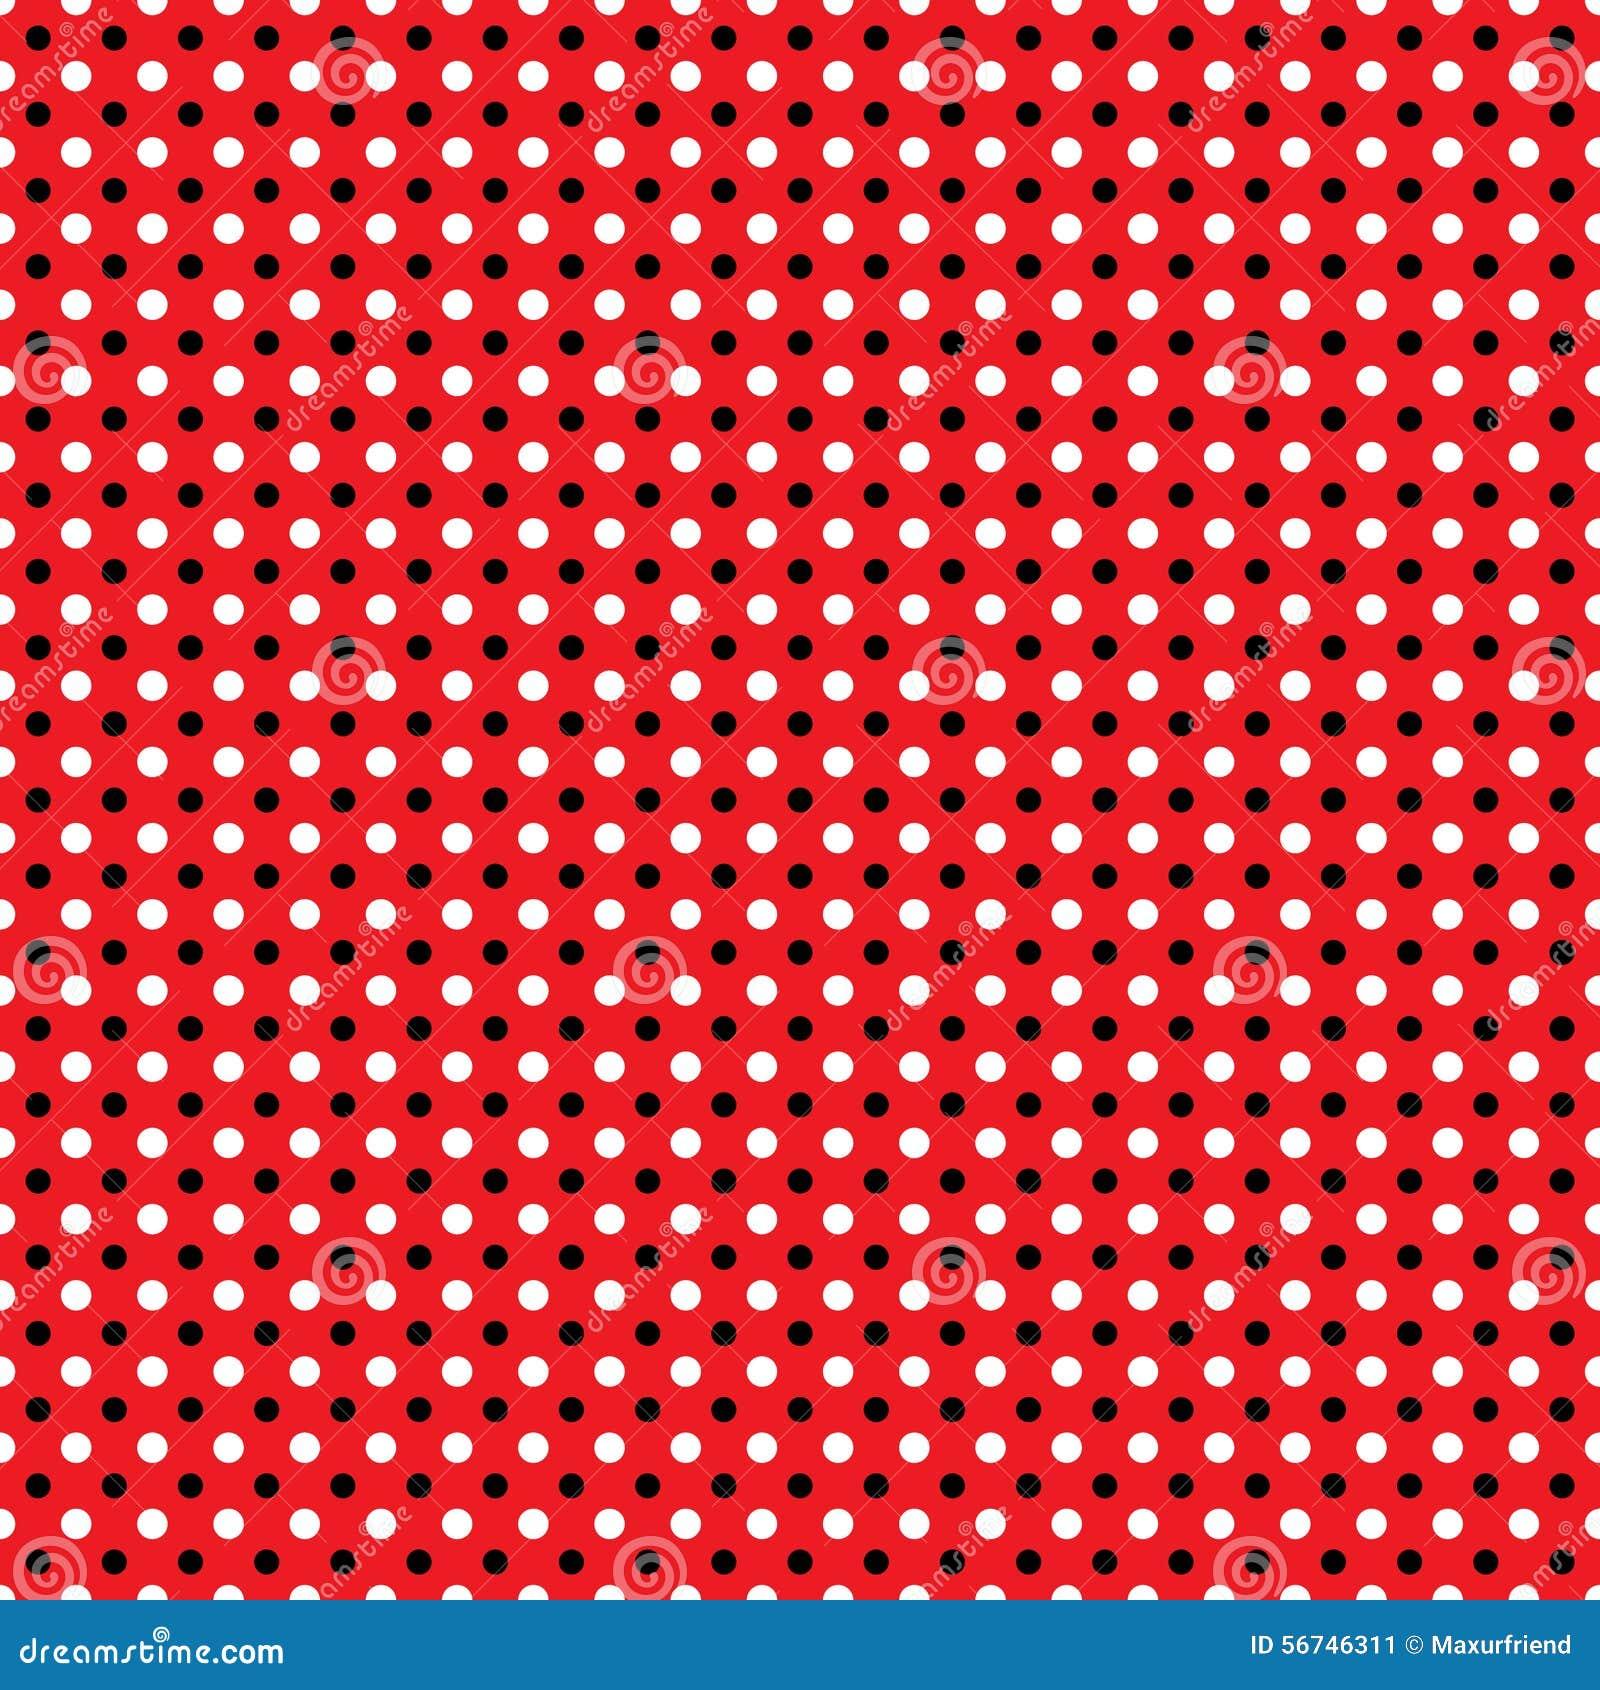 beautiful seamless white black polka dots pattern on red